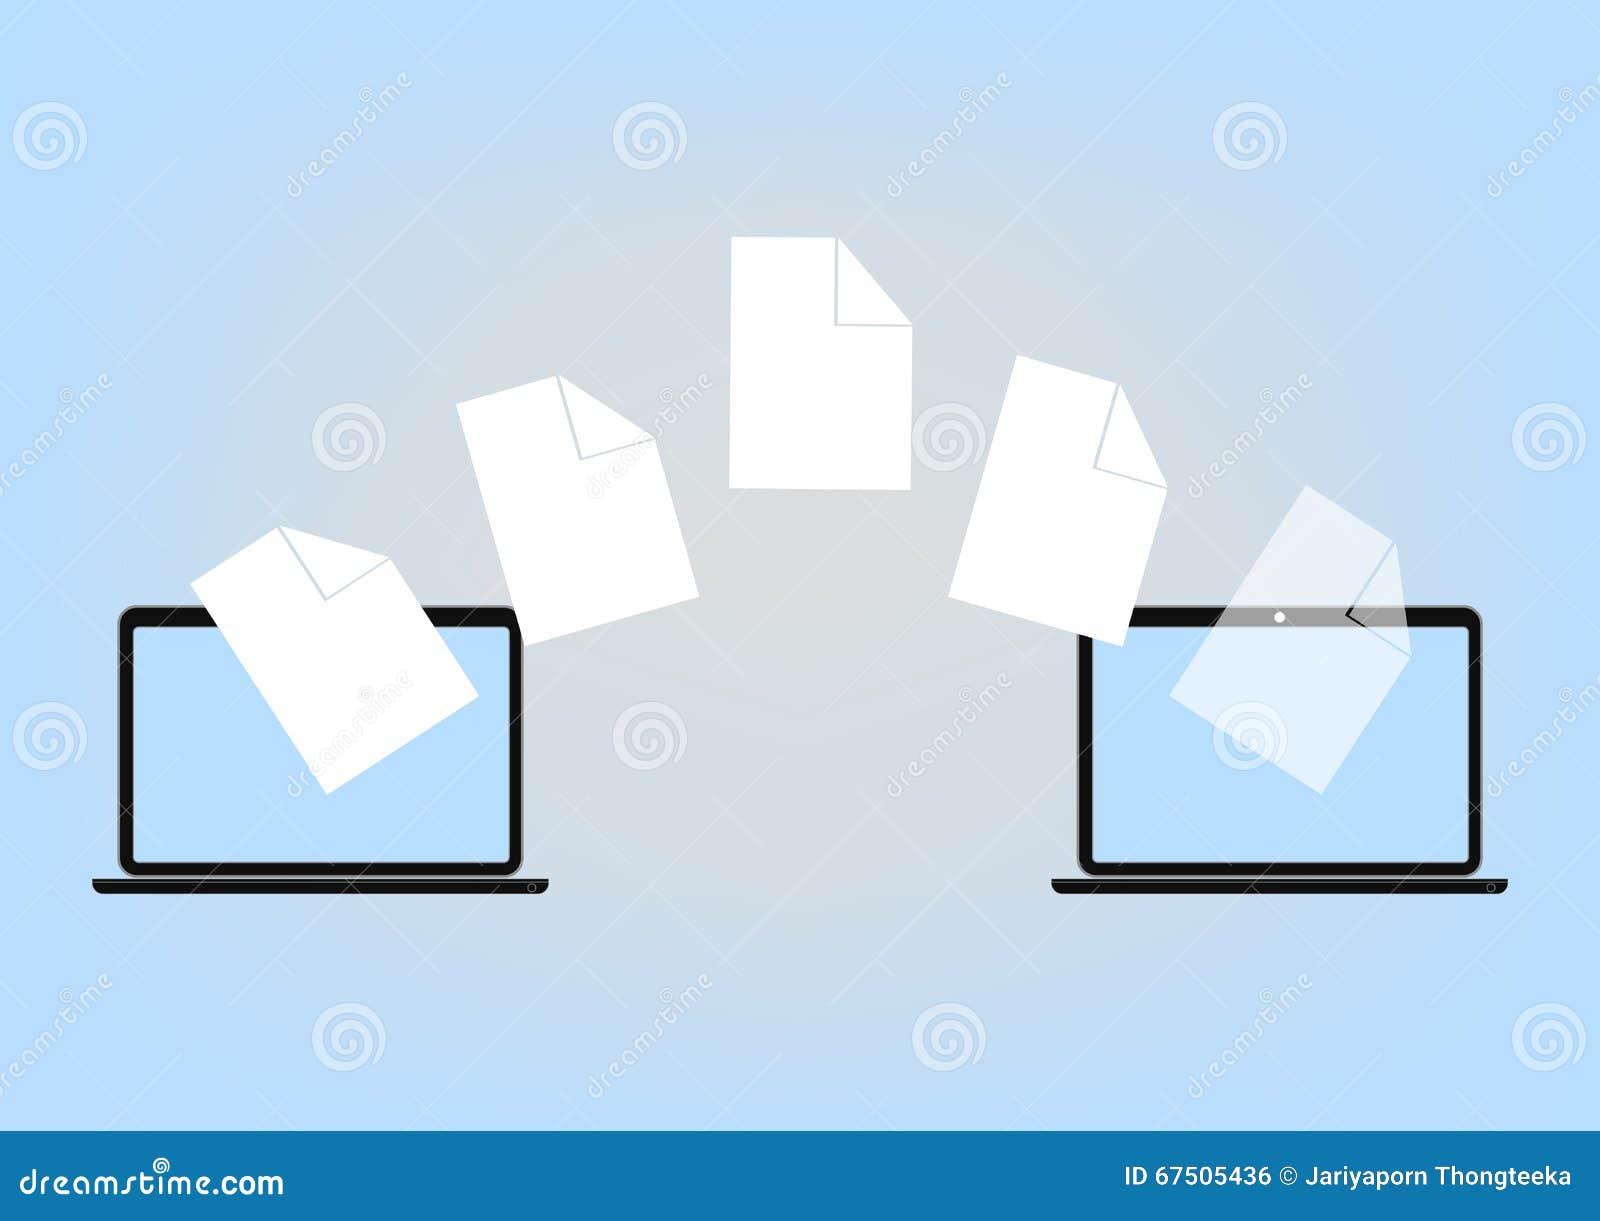 File Sharing Between Laptop Via Cloud Computing Technology